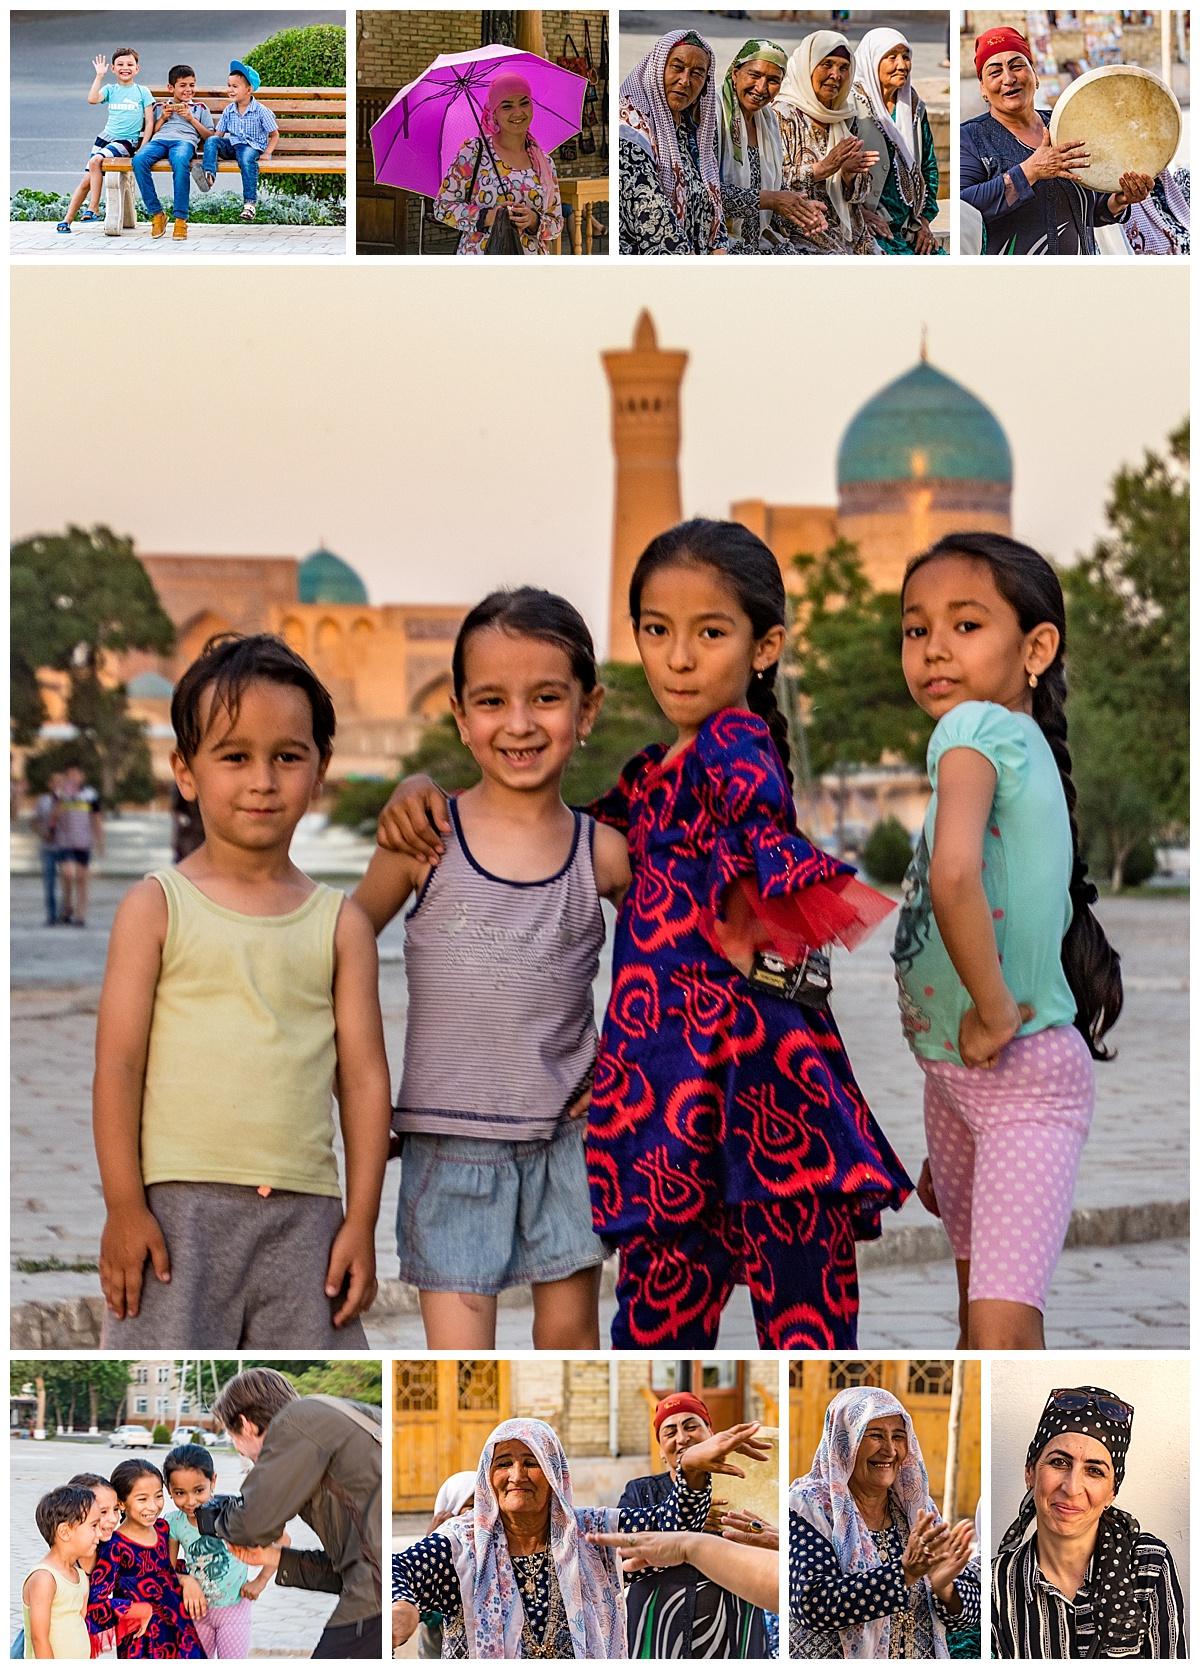 Bukhara, Uzbekistan - people